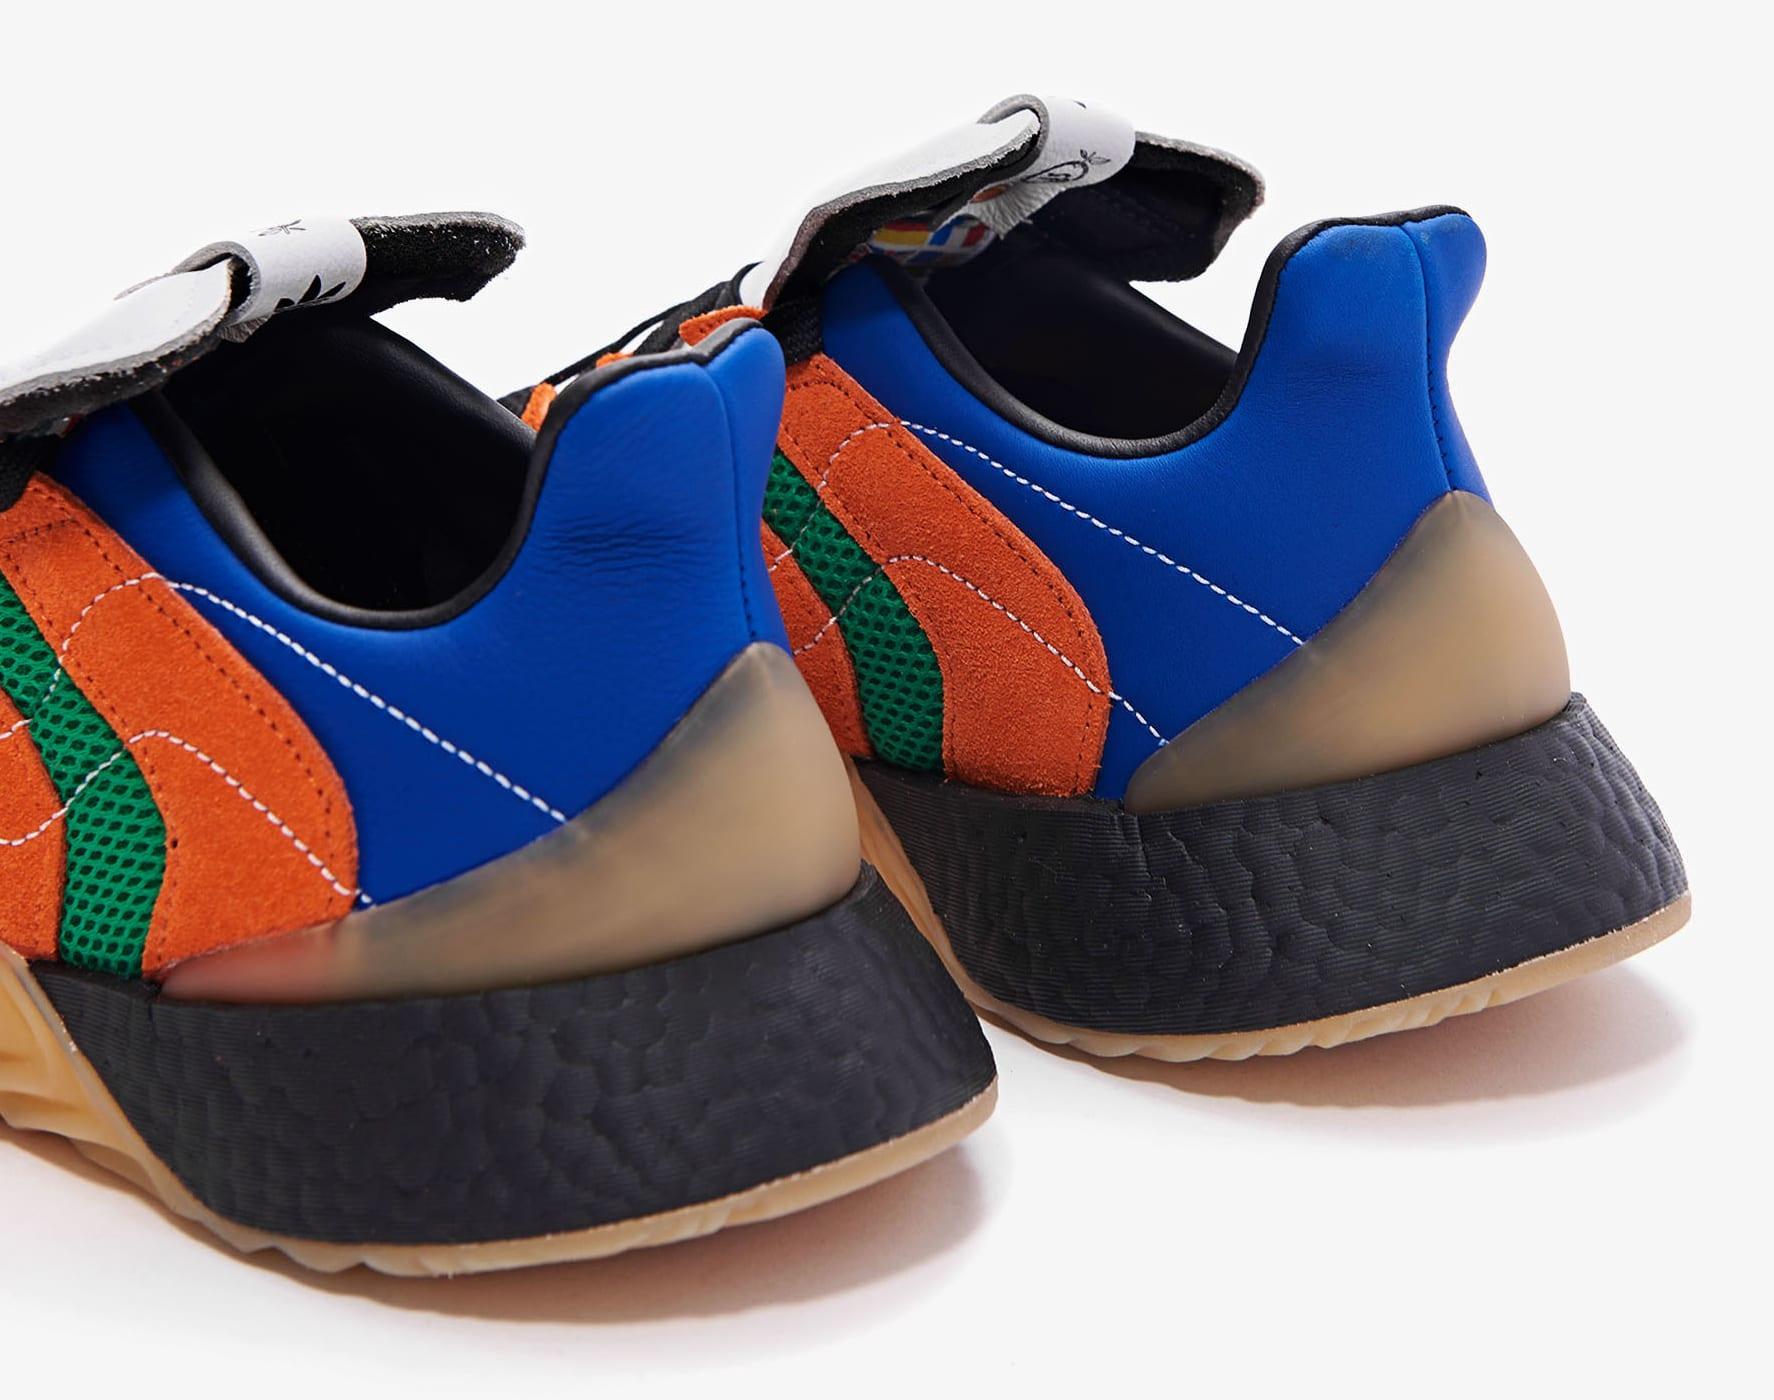 SVD x Adidas Sobakov Boost G26821 (Heel)